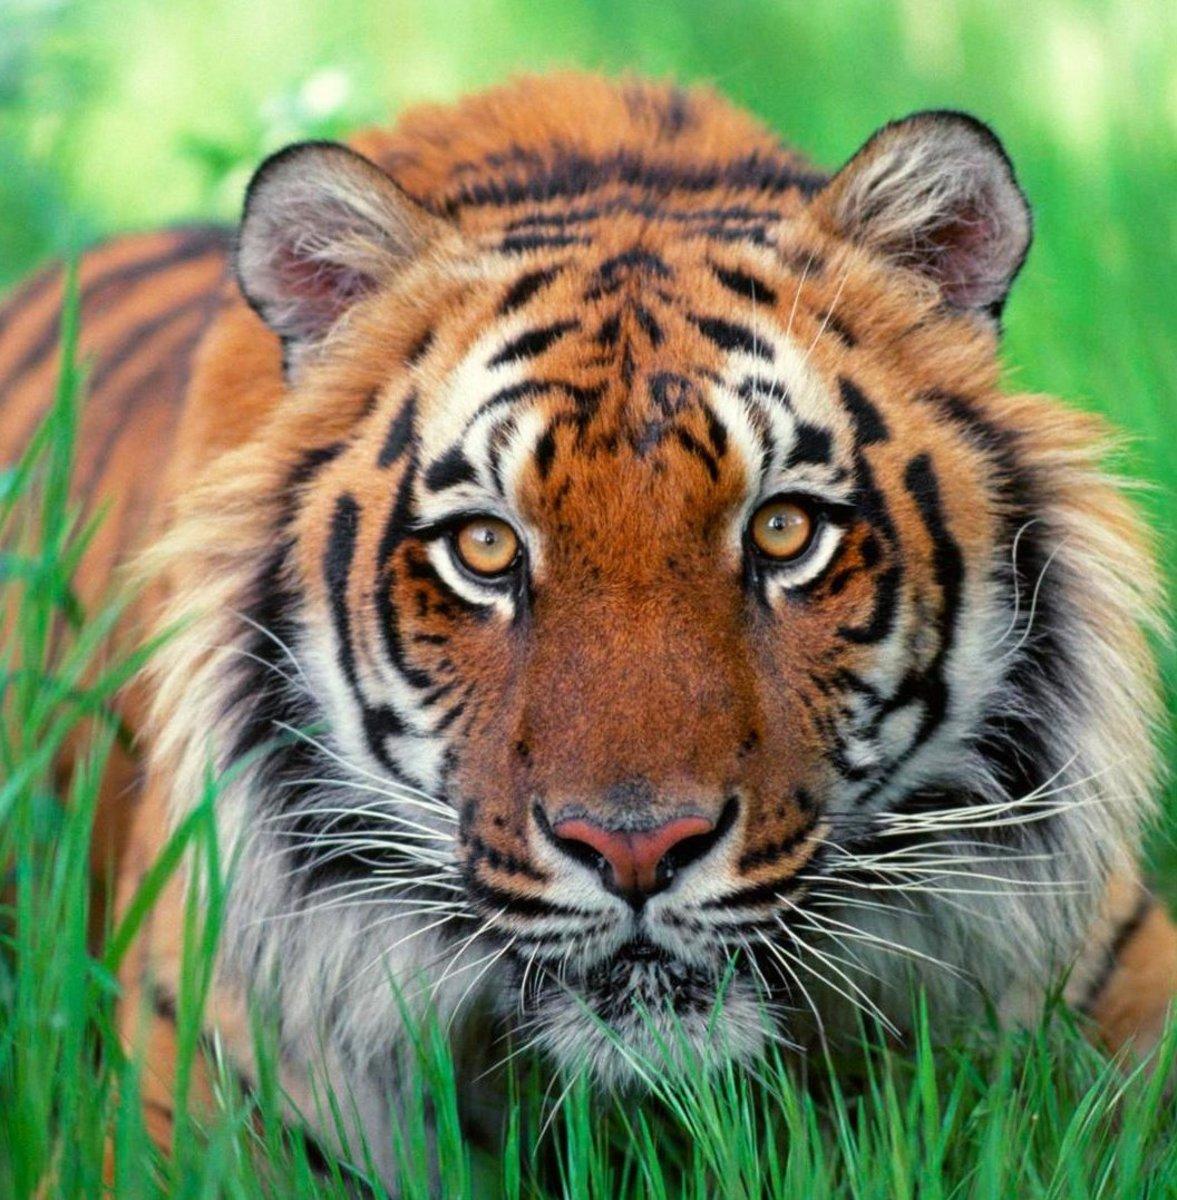 tiger - photo #38